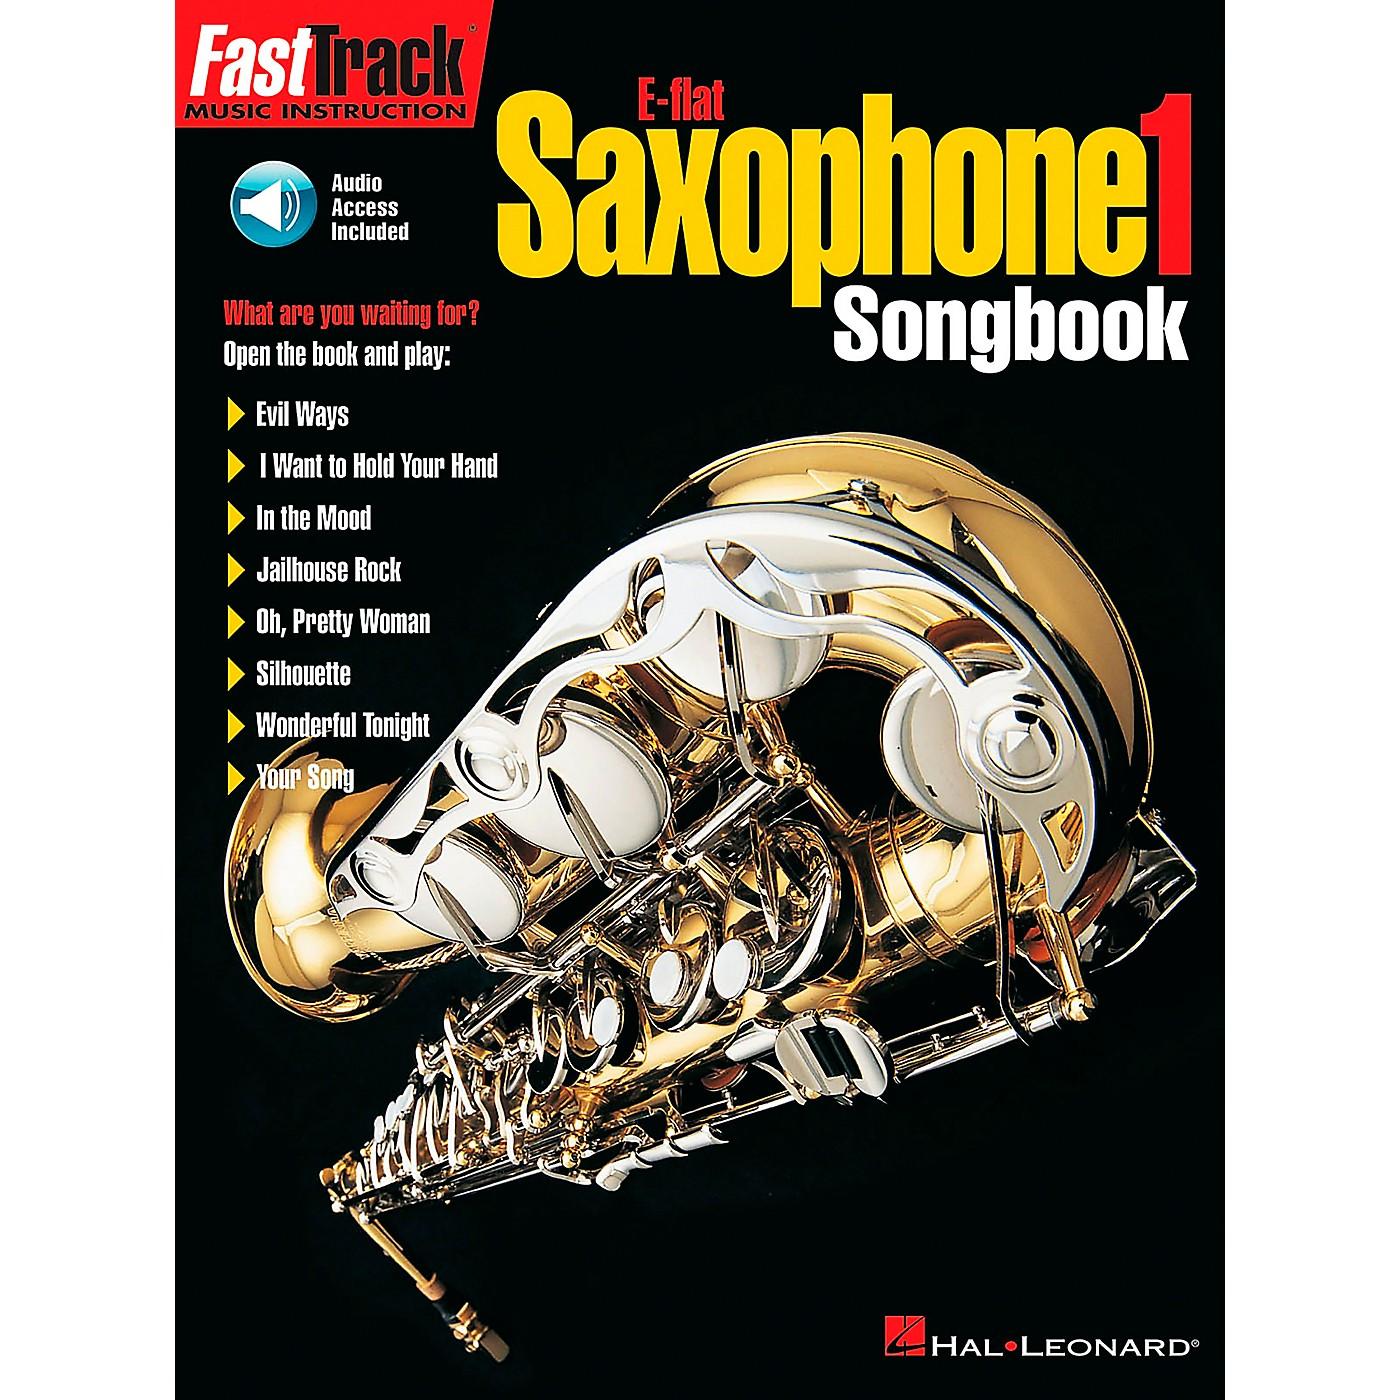 Hal Leonard FastTrack E Flat Alto Saxophone Songbook 1 Level 1 Book/CD thumbnail